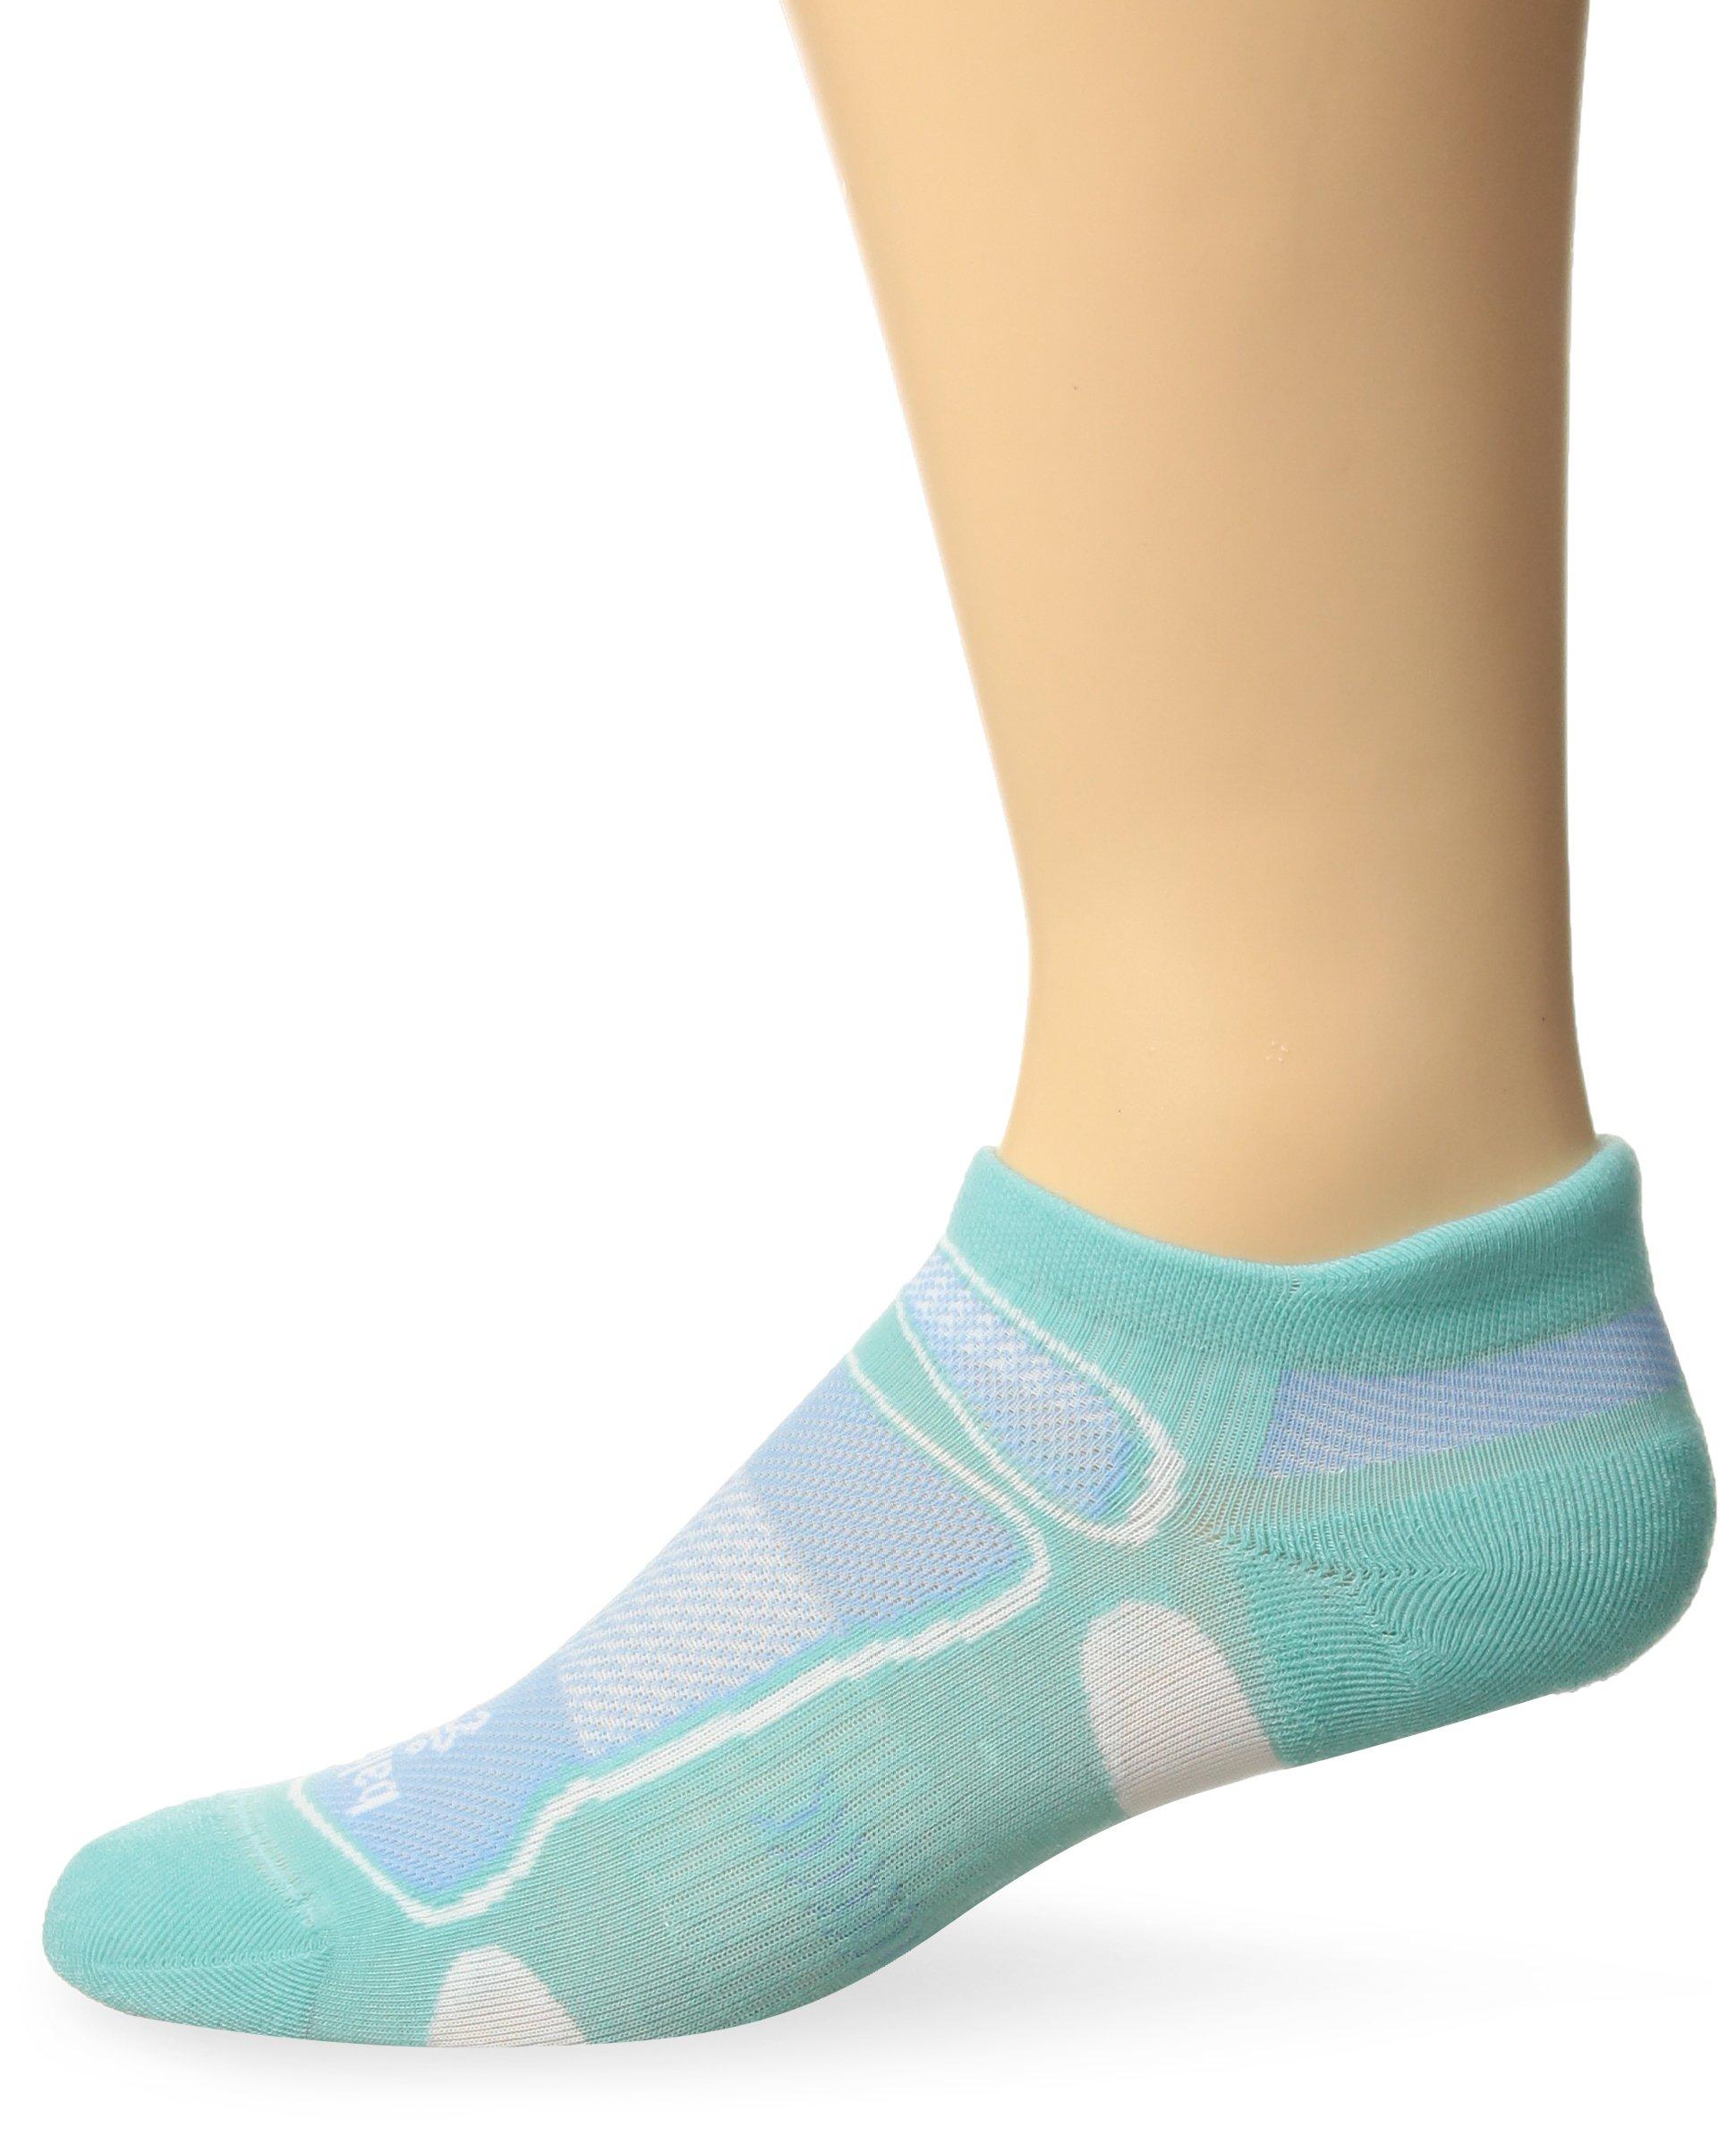 Balega Ultralight No Show Athletic Running Socks for Men and Women (1-Pair), Aqua, Small